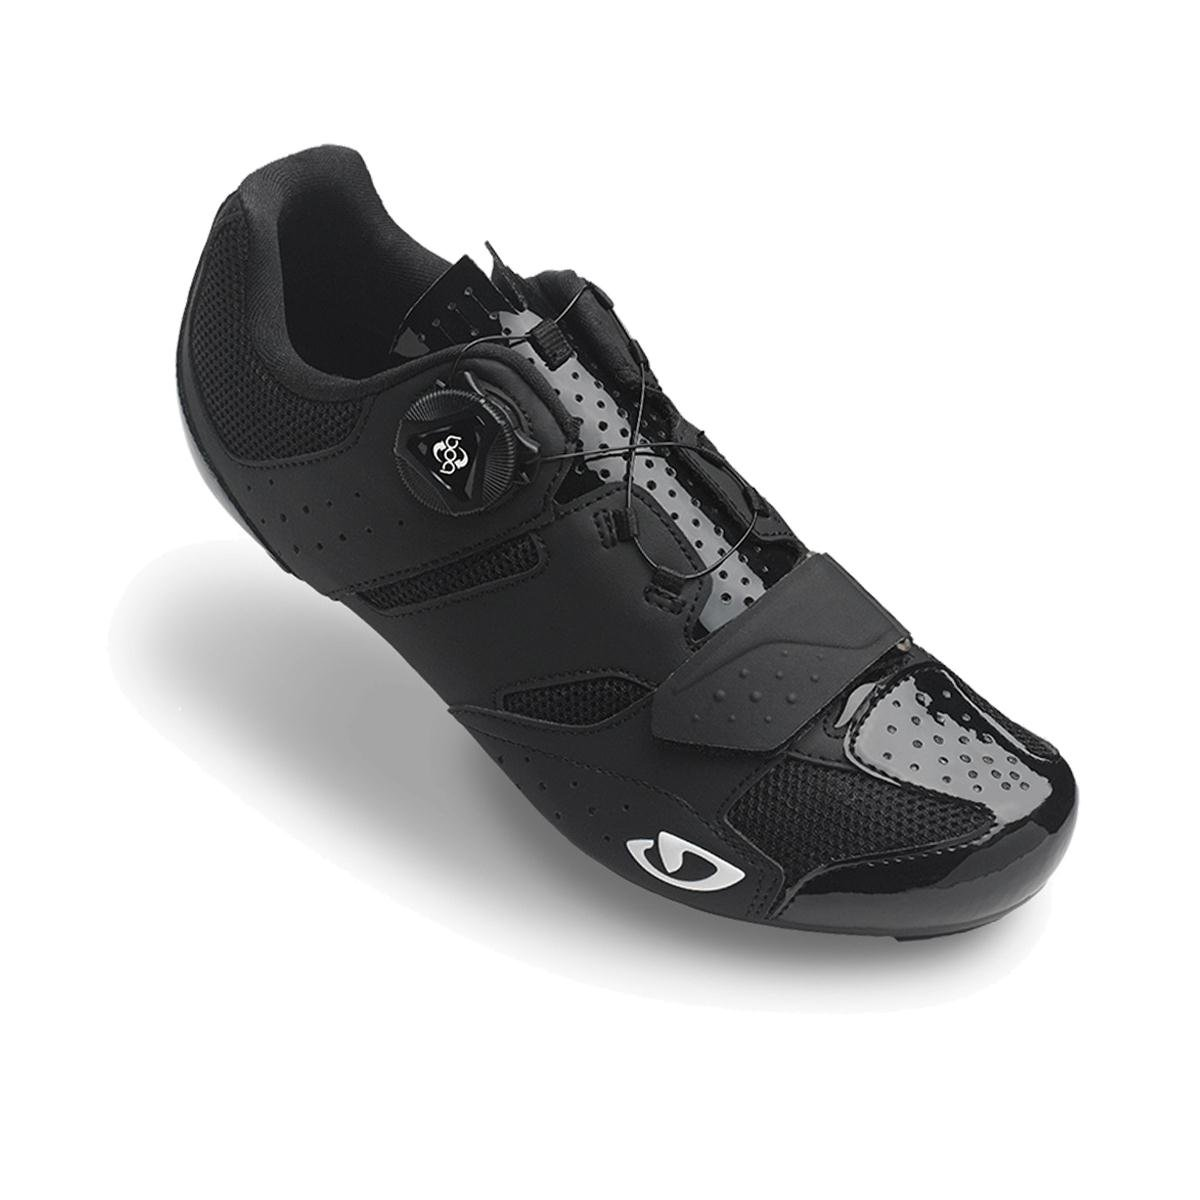 Giro Savix Road, Chaussures de Vélo de Route Femme Chaussures de Vélo de Route Femme